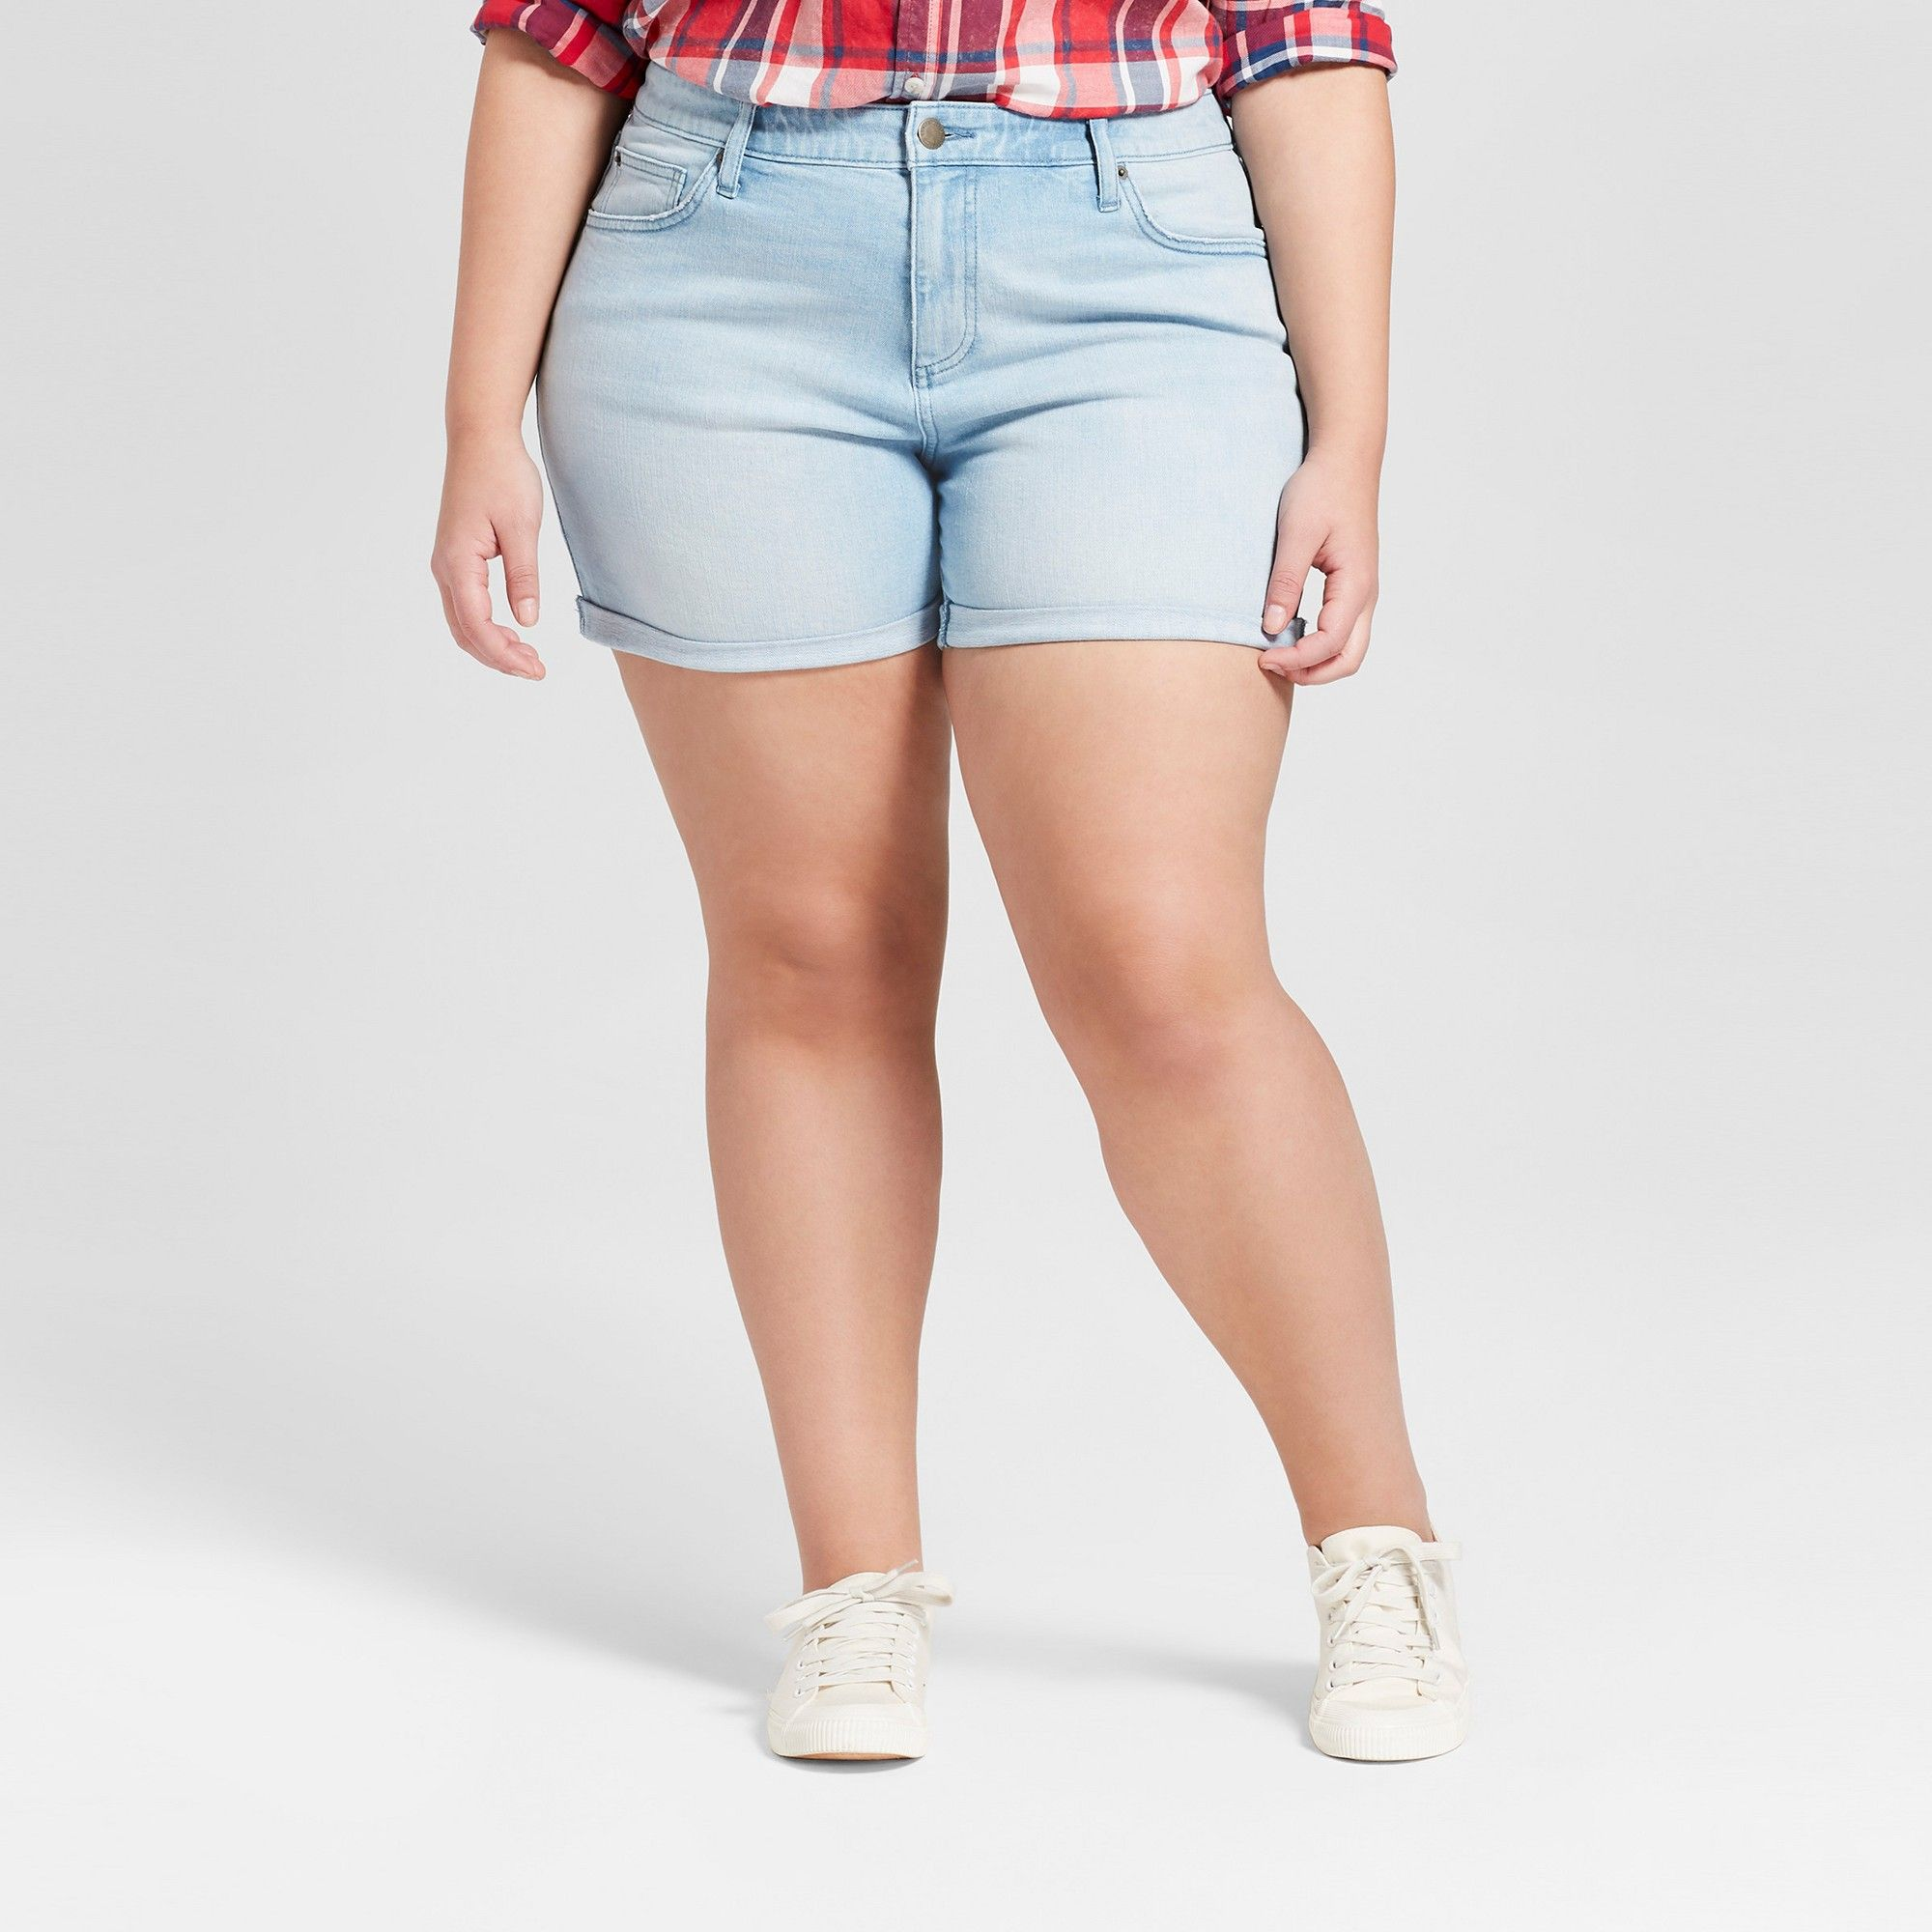 867fe02bcc160 Women s Plus Size Raw Hem Boyfriend Jeans Shorts - Universal Thread Light  Wash 20W